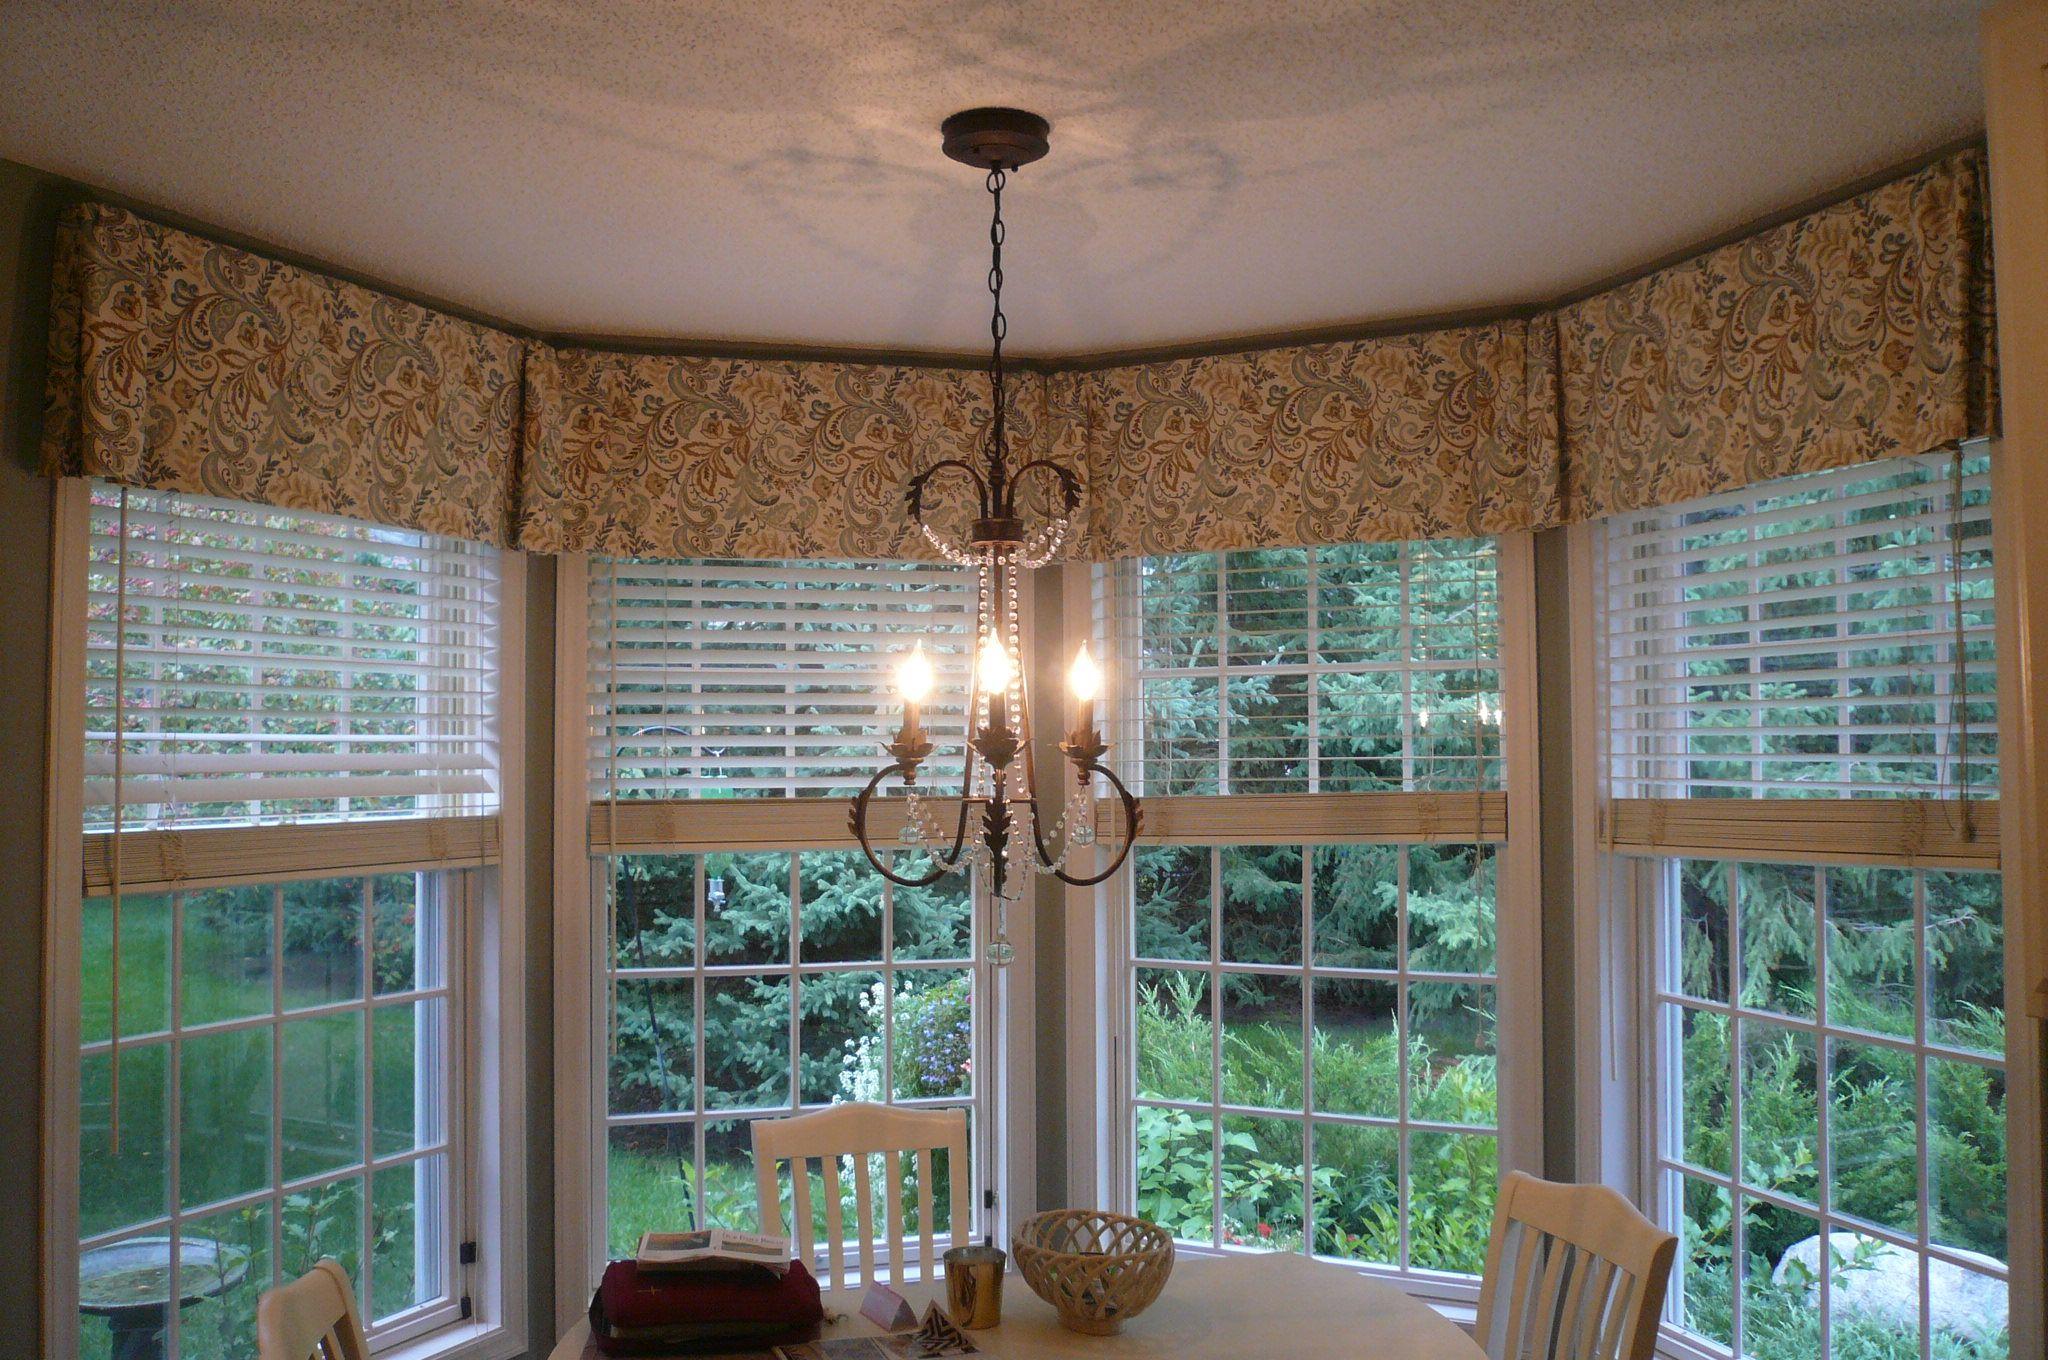 Bay Window Valance | box pleated valance to tie 4 windows together ...